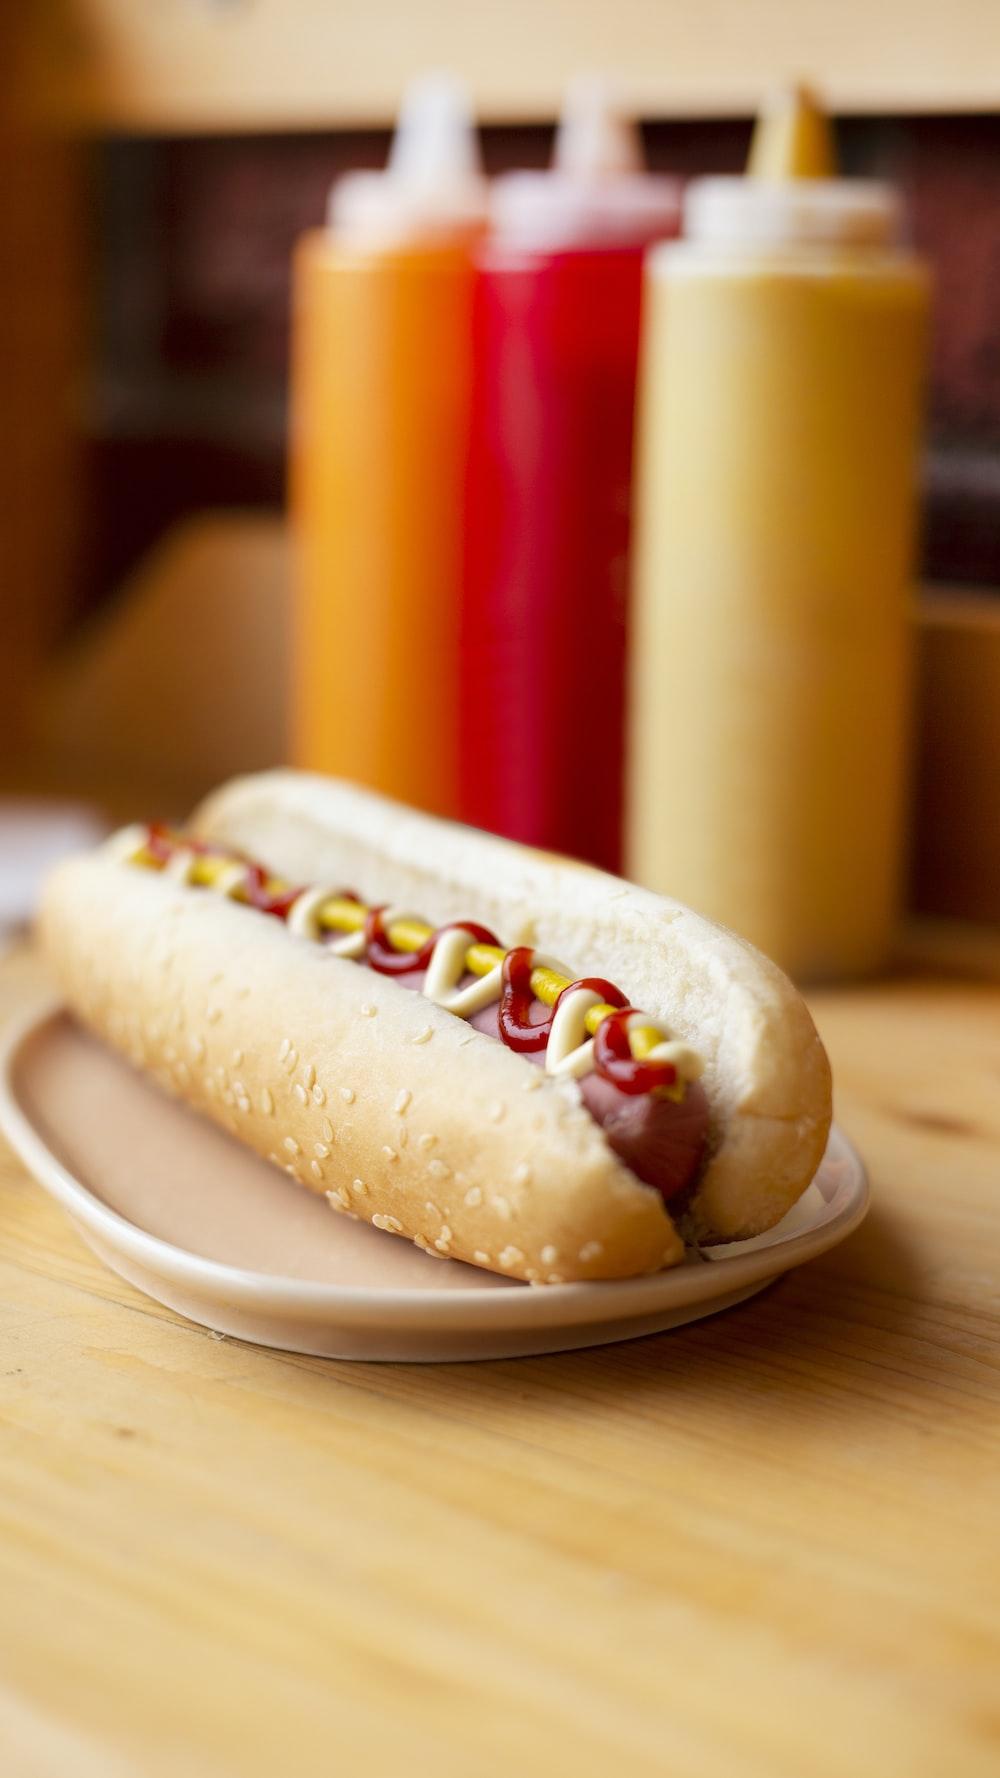 hotdog sandwich on white plate